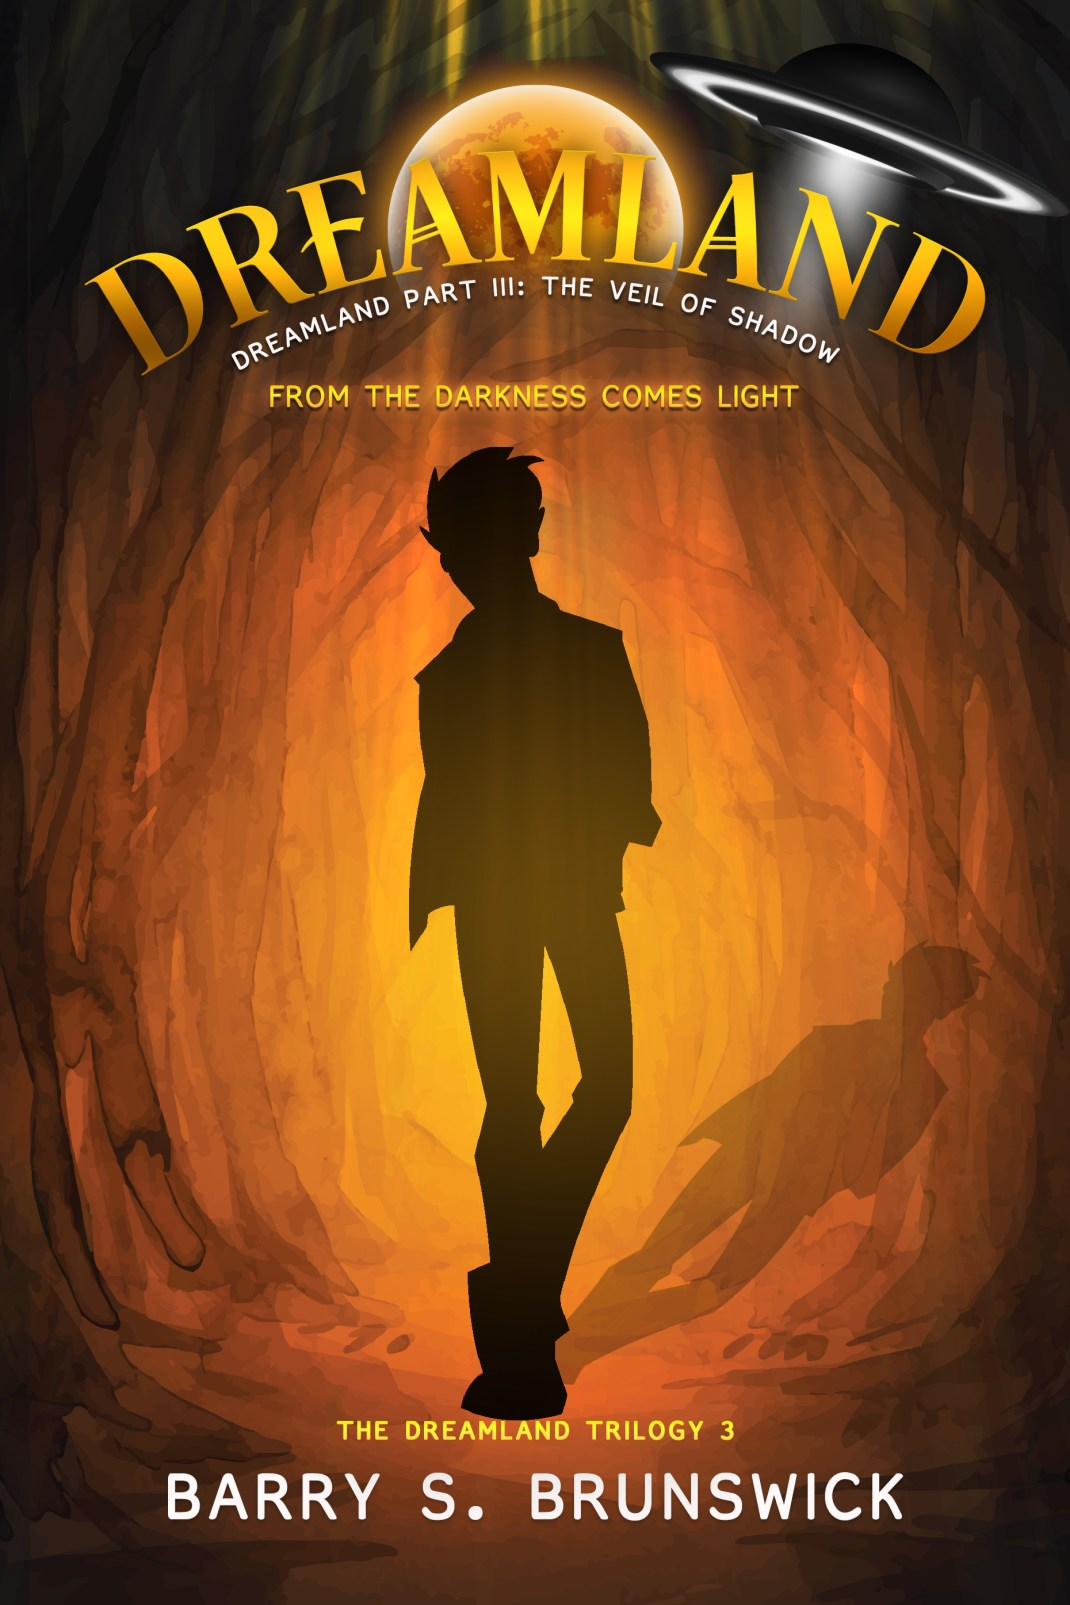 Barry S. Brunswick The Dreamland Trilogy Part 3